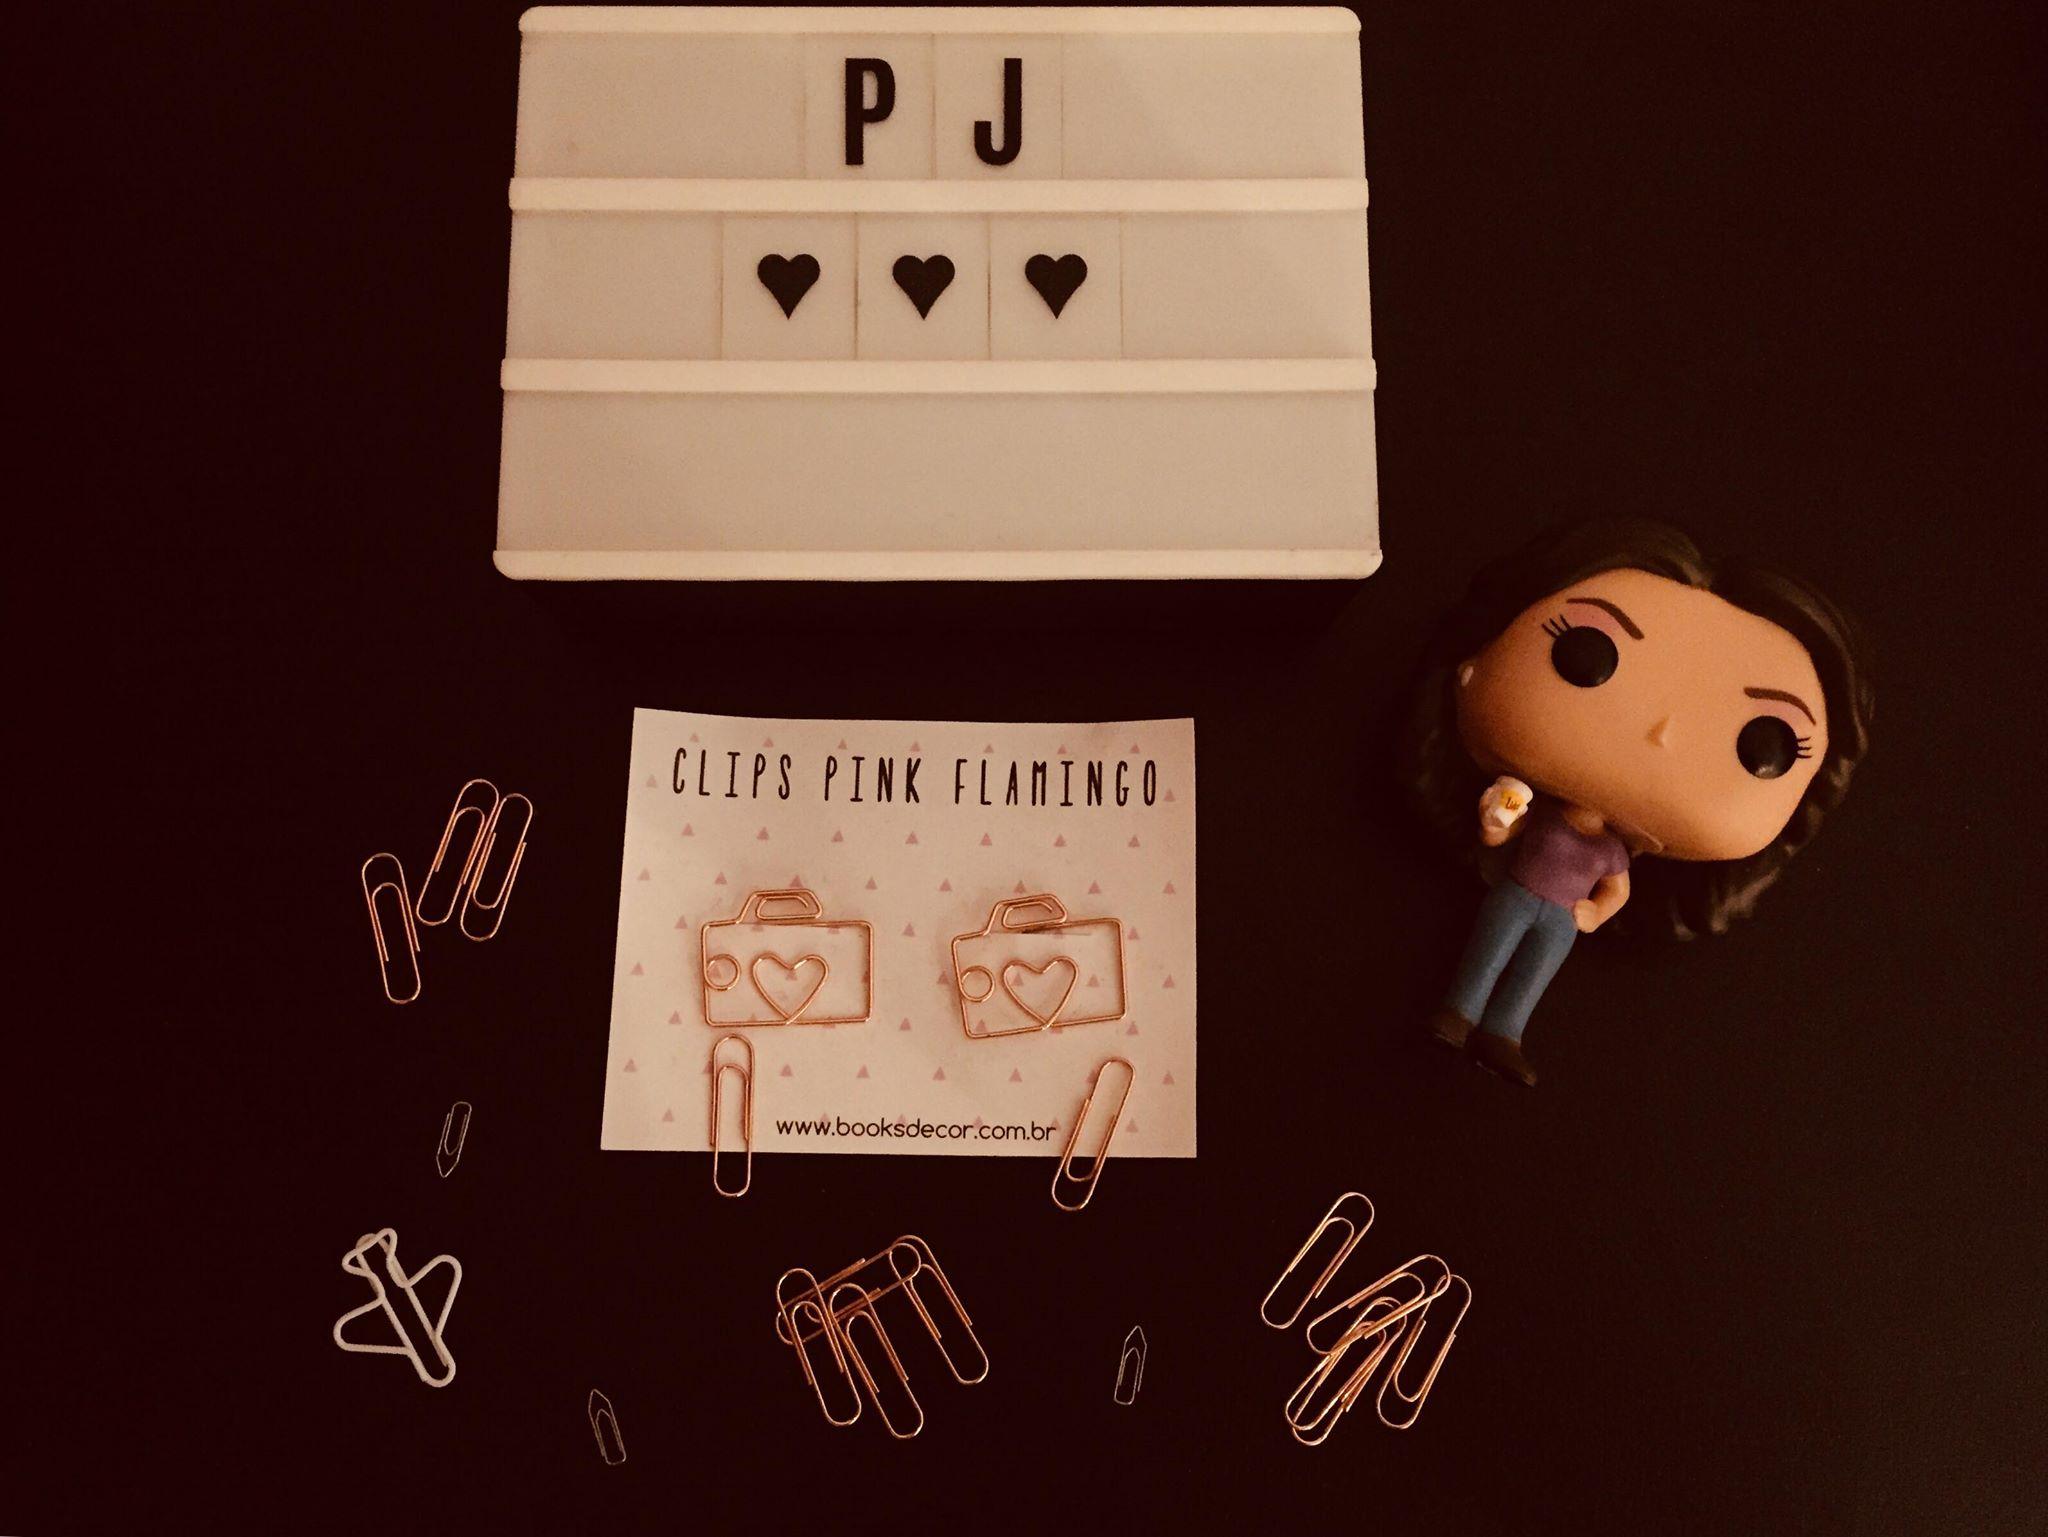 PJ - Clips e afins - 1